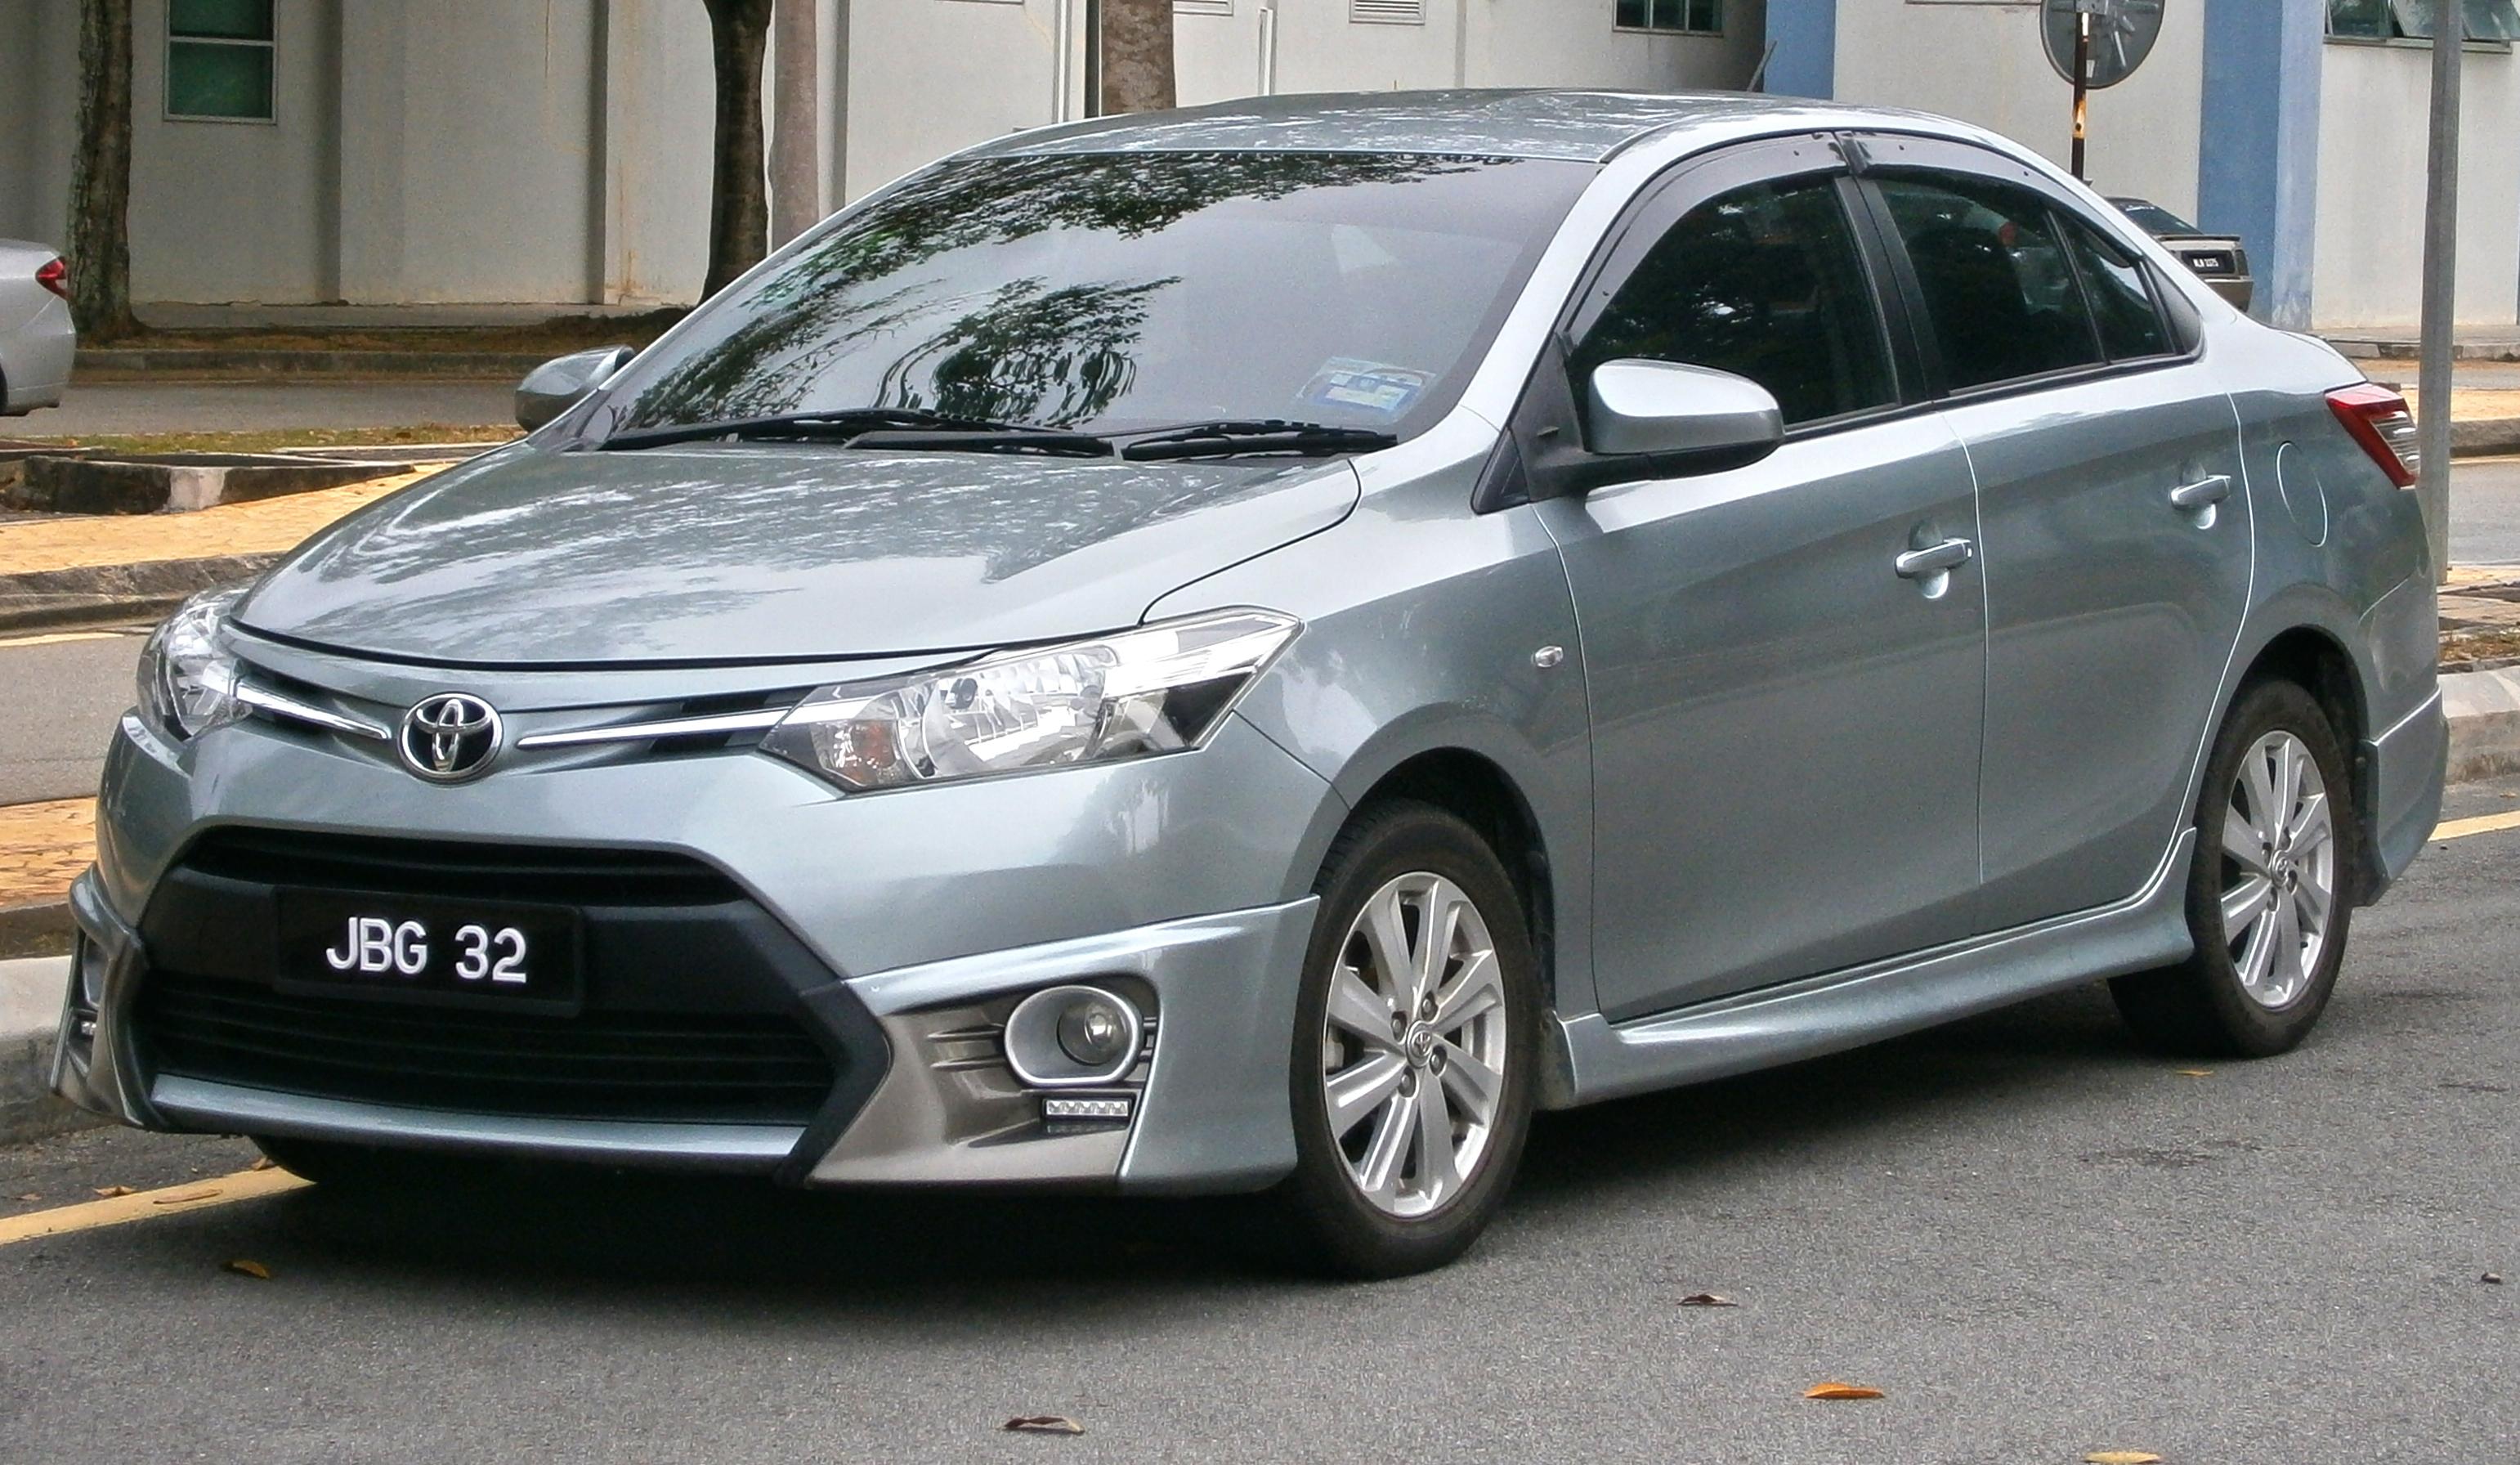 File 2015 Toyota Vios Xp150 1 5j 4 Door Sedan With